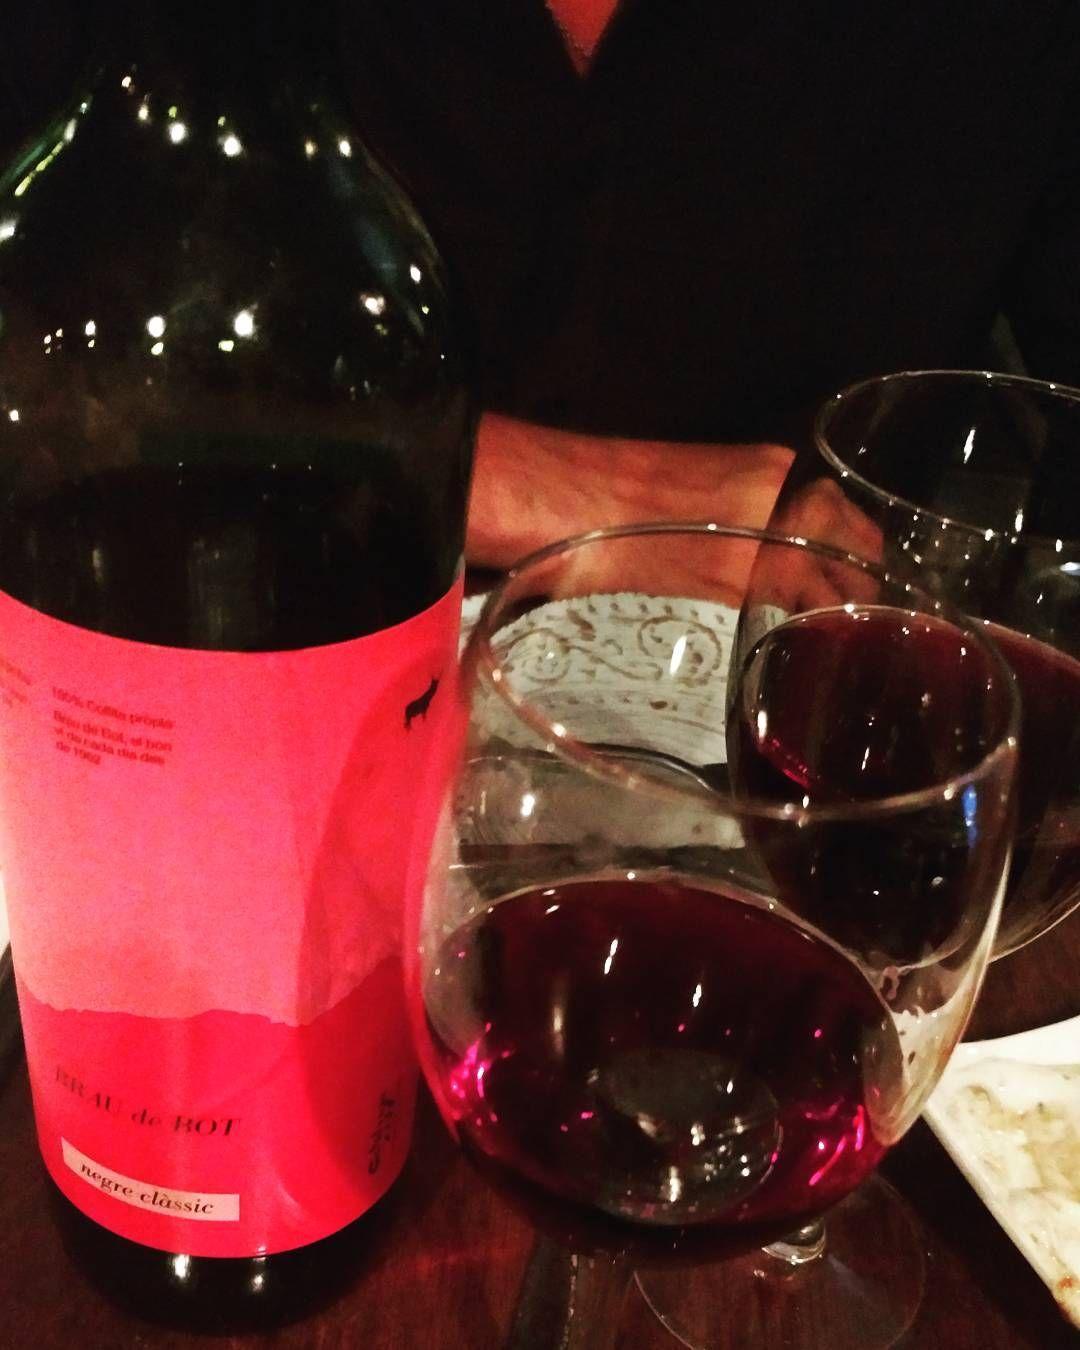 Bout Last Nite Wine Winetasting Elborn Barcelona Brostrip Vino Tinto Travelgram Restaurant Catalonia Espana Restaurantes Vino